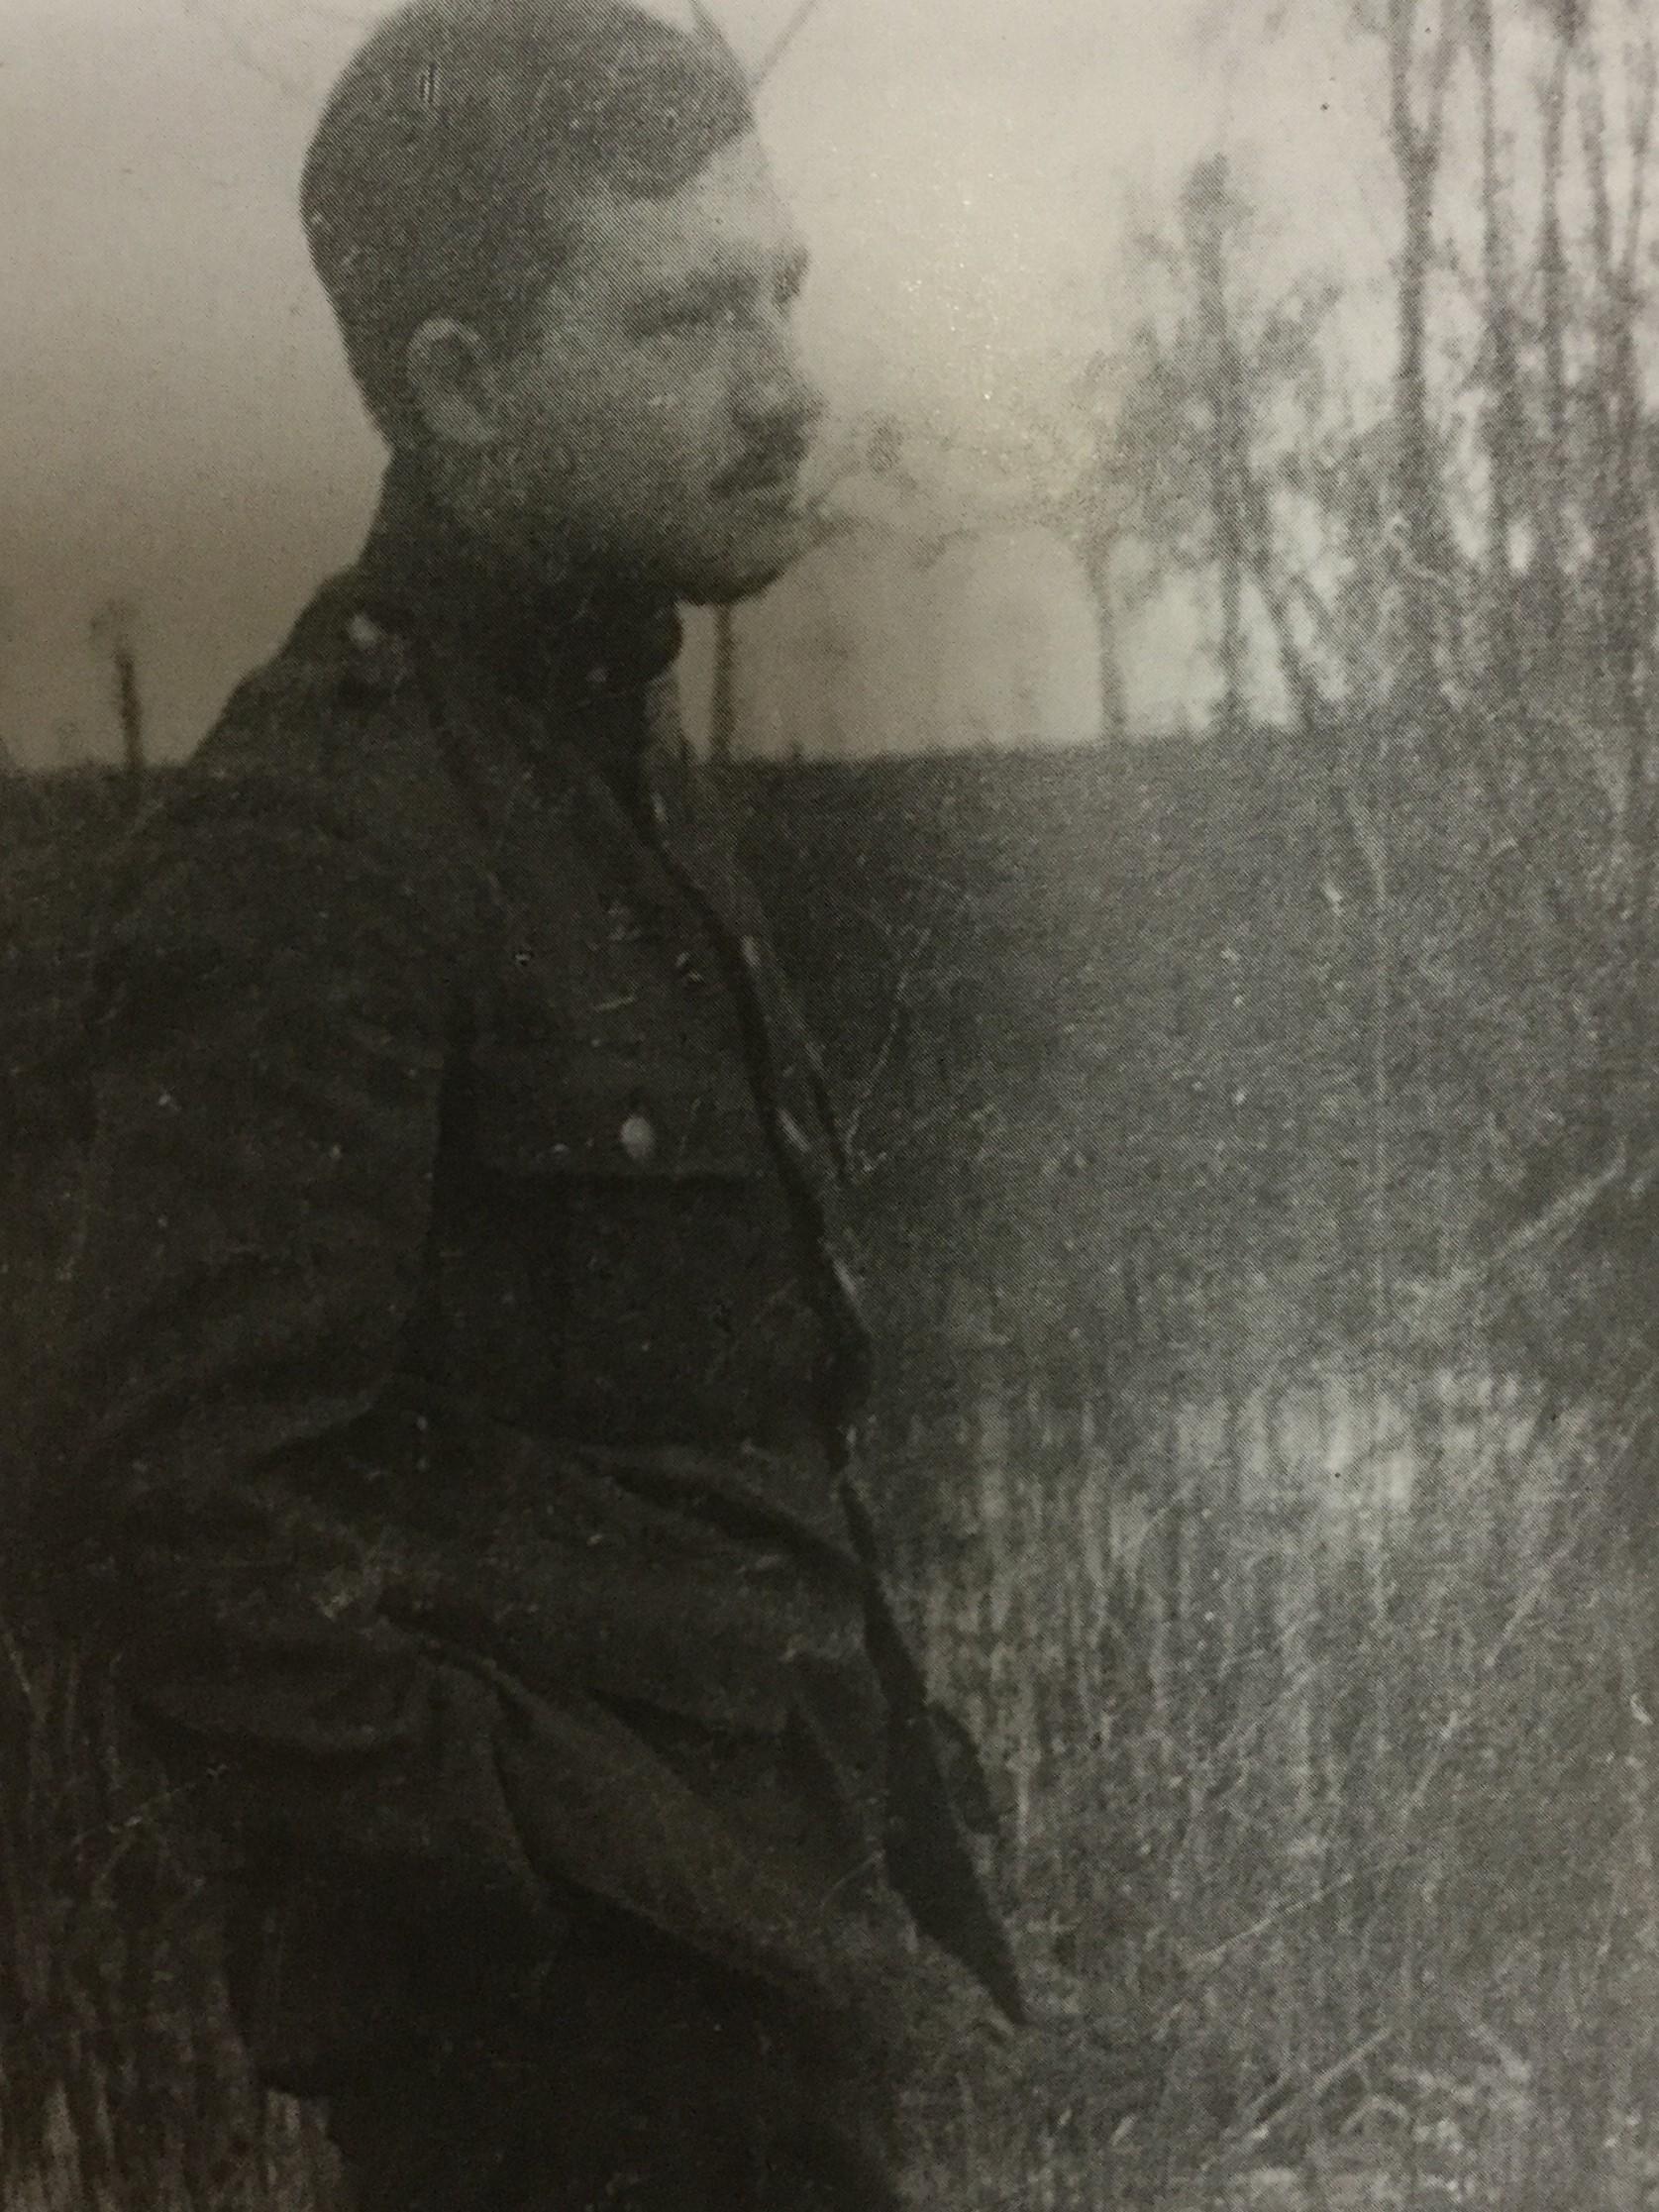 RaoulSnoeck_191809